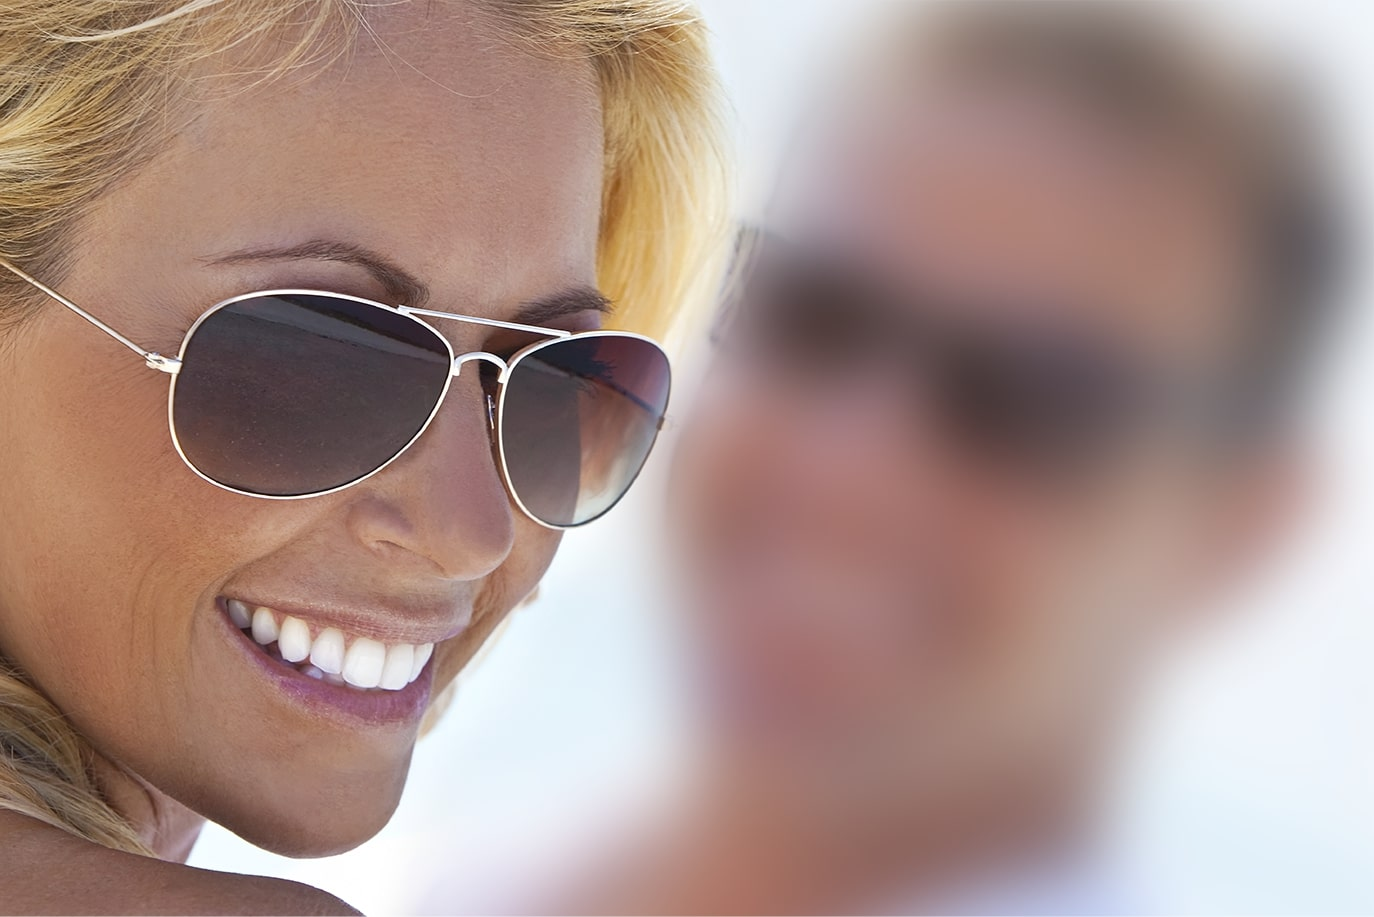 KODAK Polarized Lenses help prevent sun exposure around the eyes